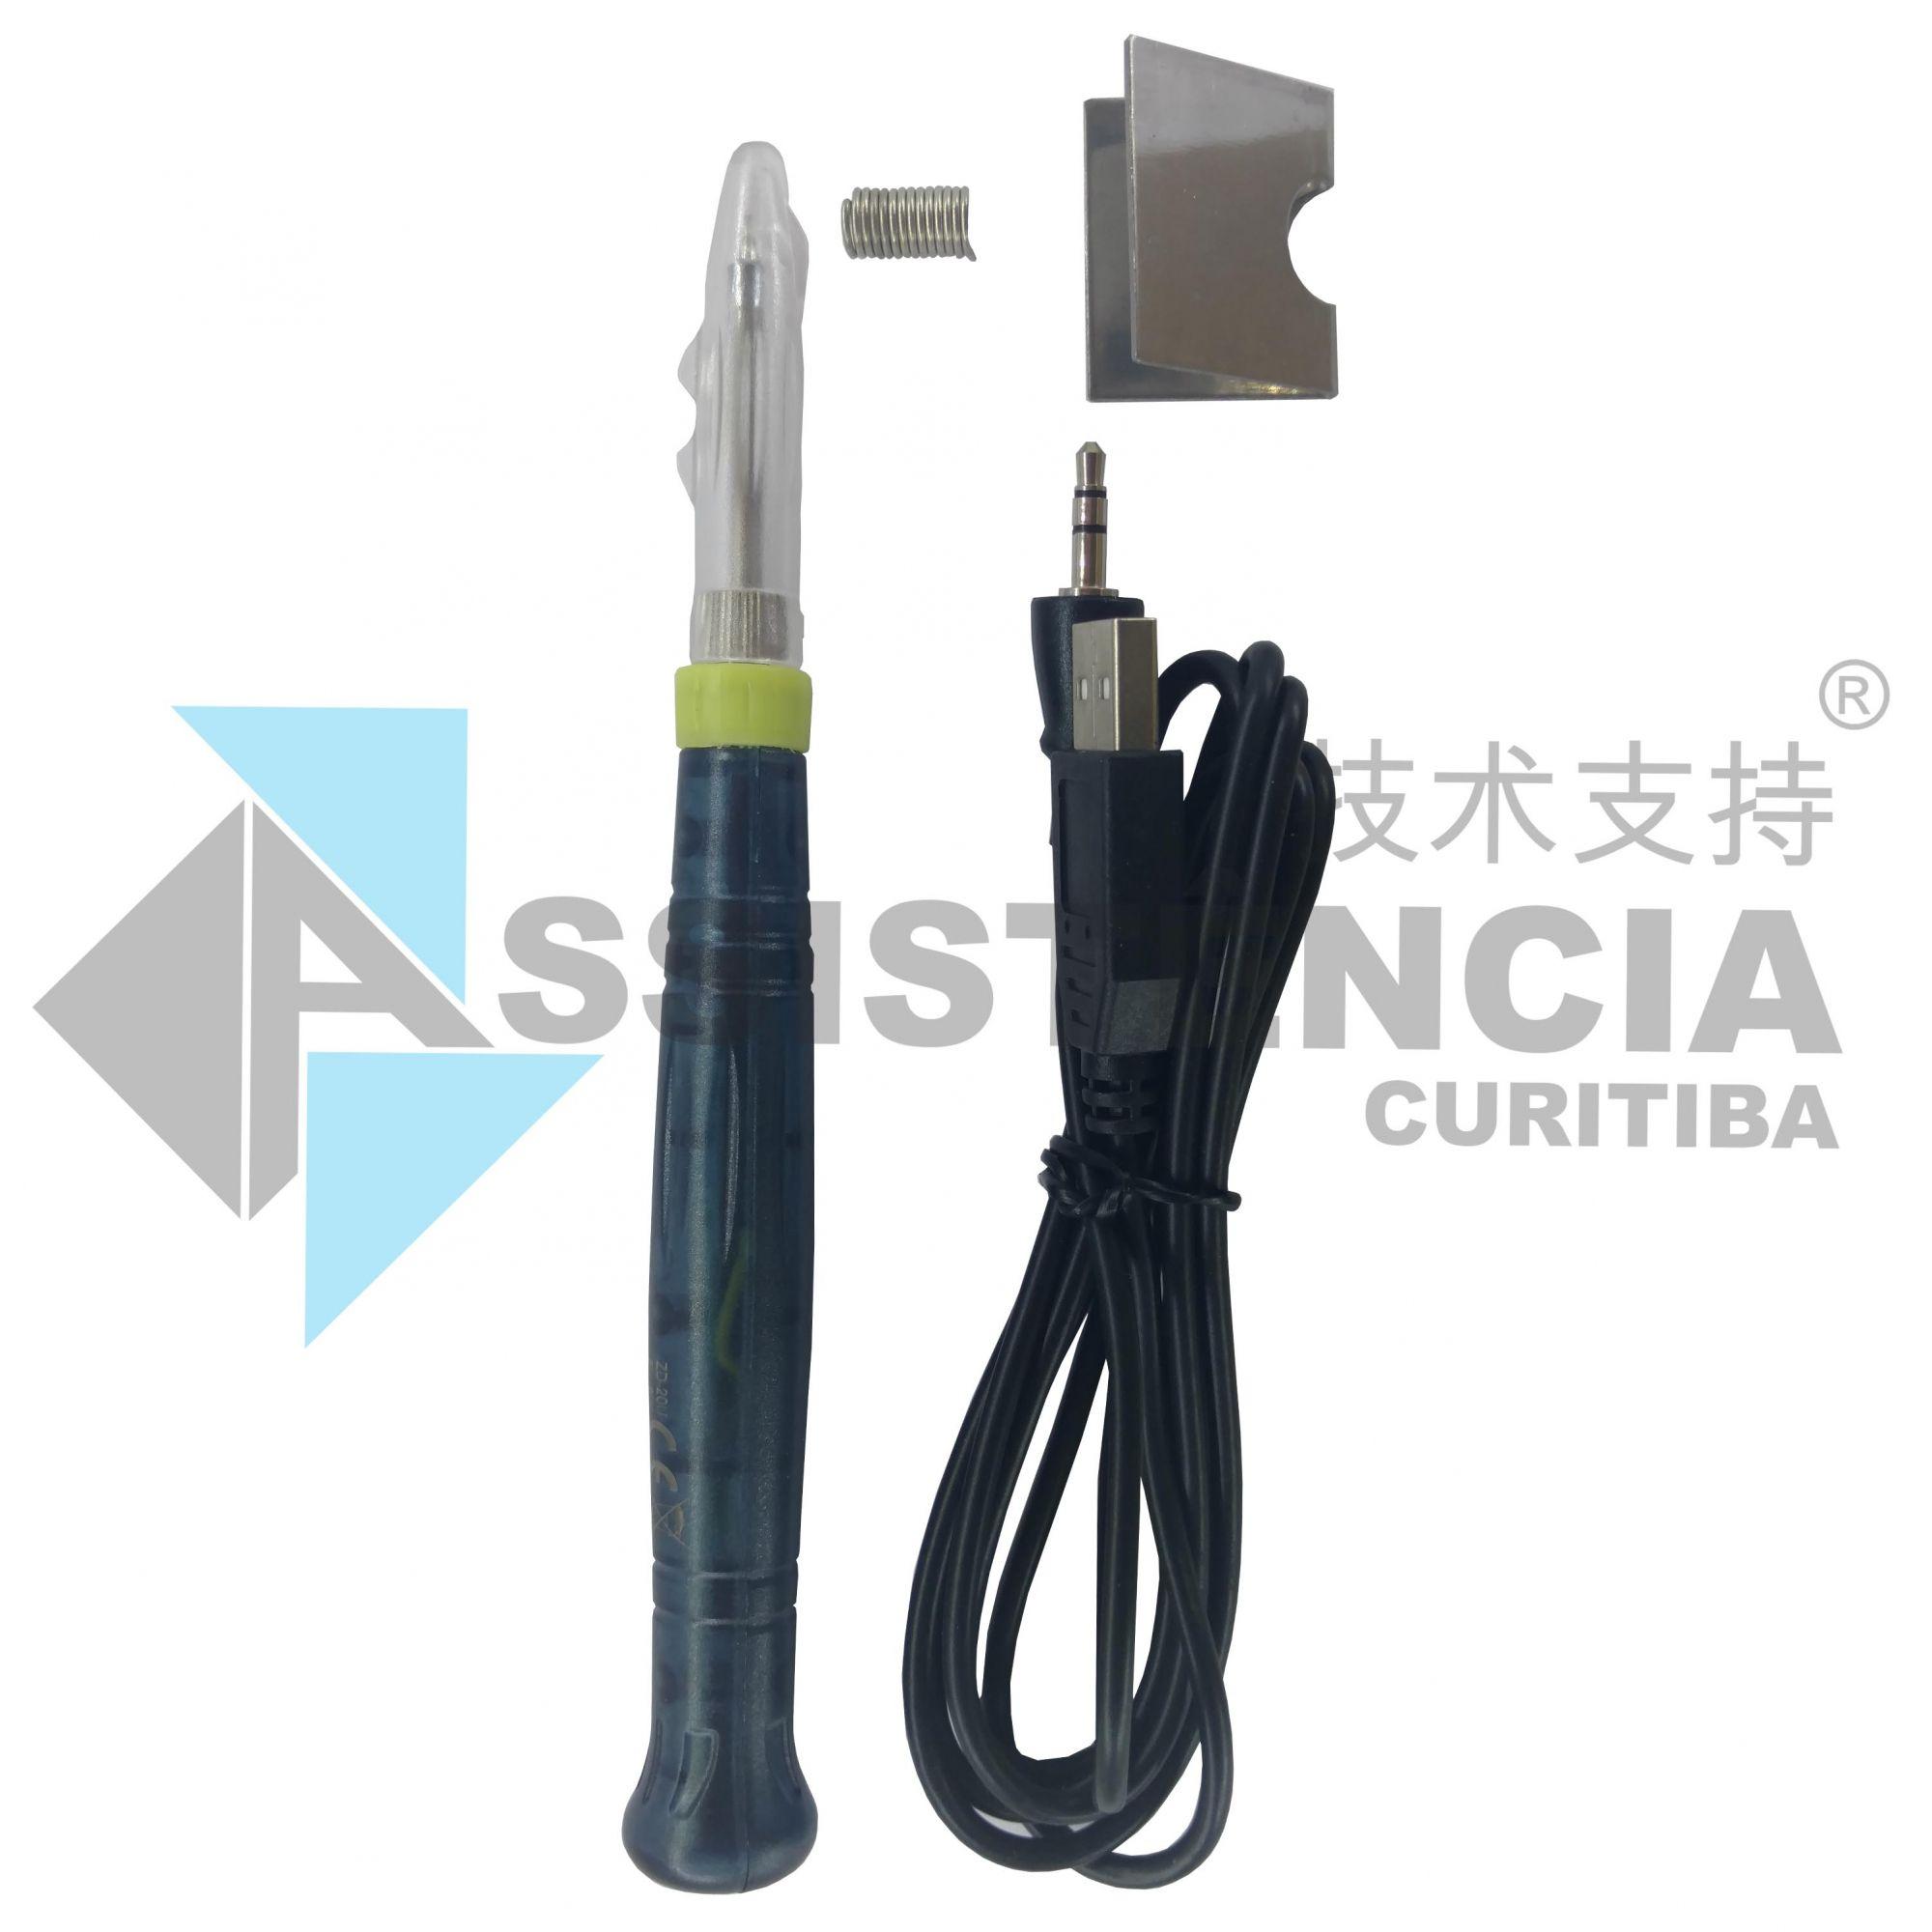 Ferro De Solda Profissional Mini Portátil Usb 5V Doss 7D-20V